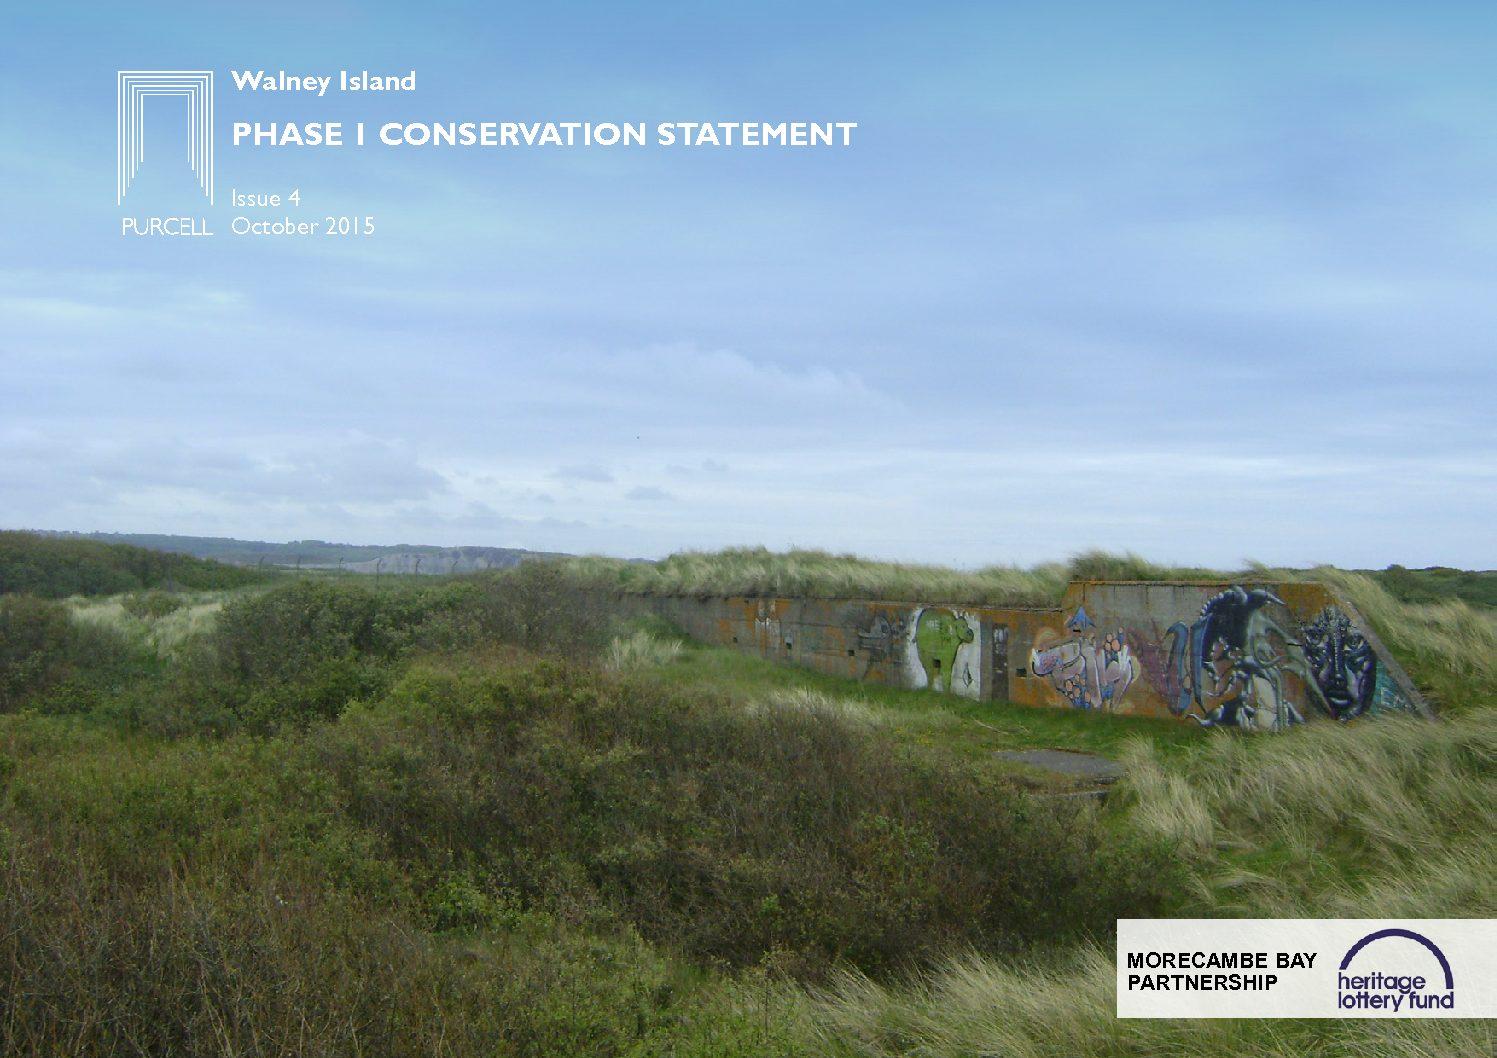 Walney Island Phase 1 Conservation Statement